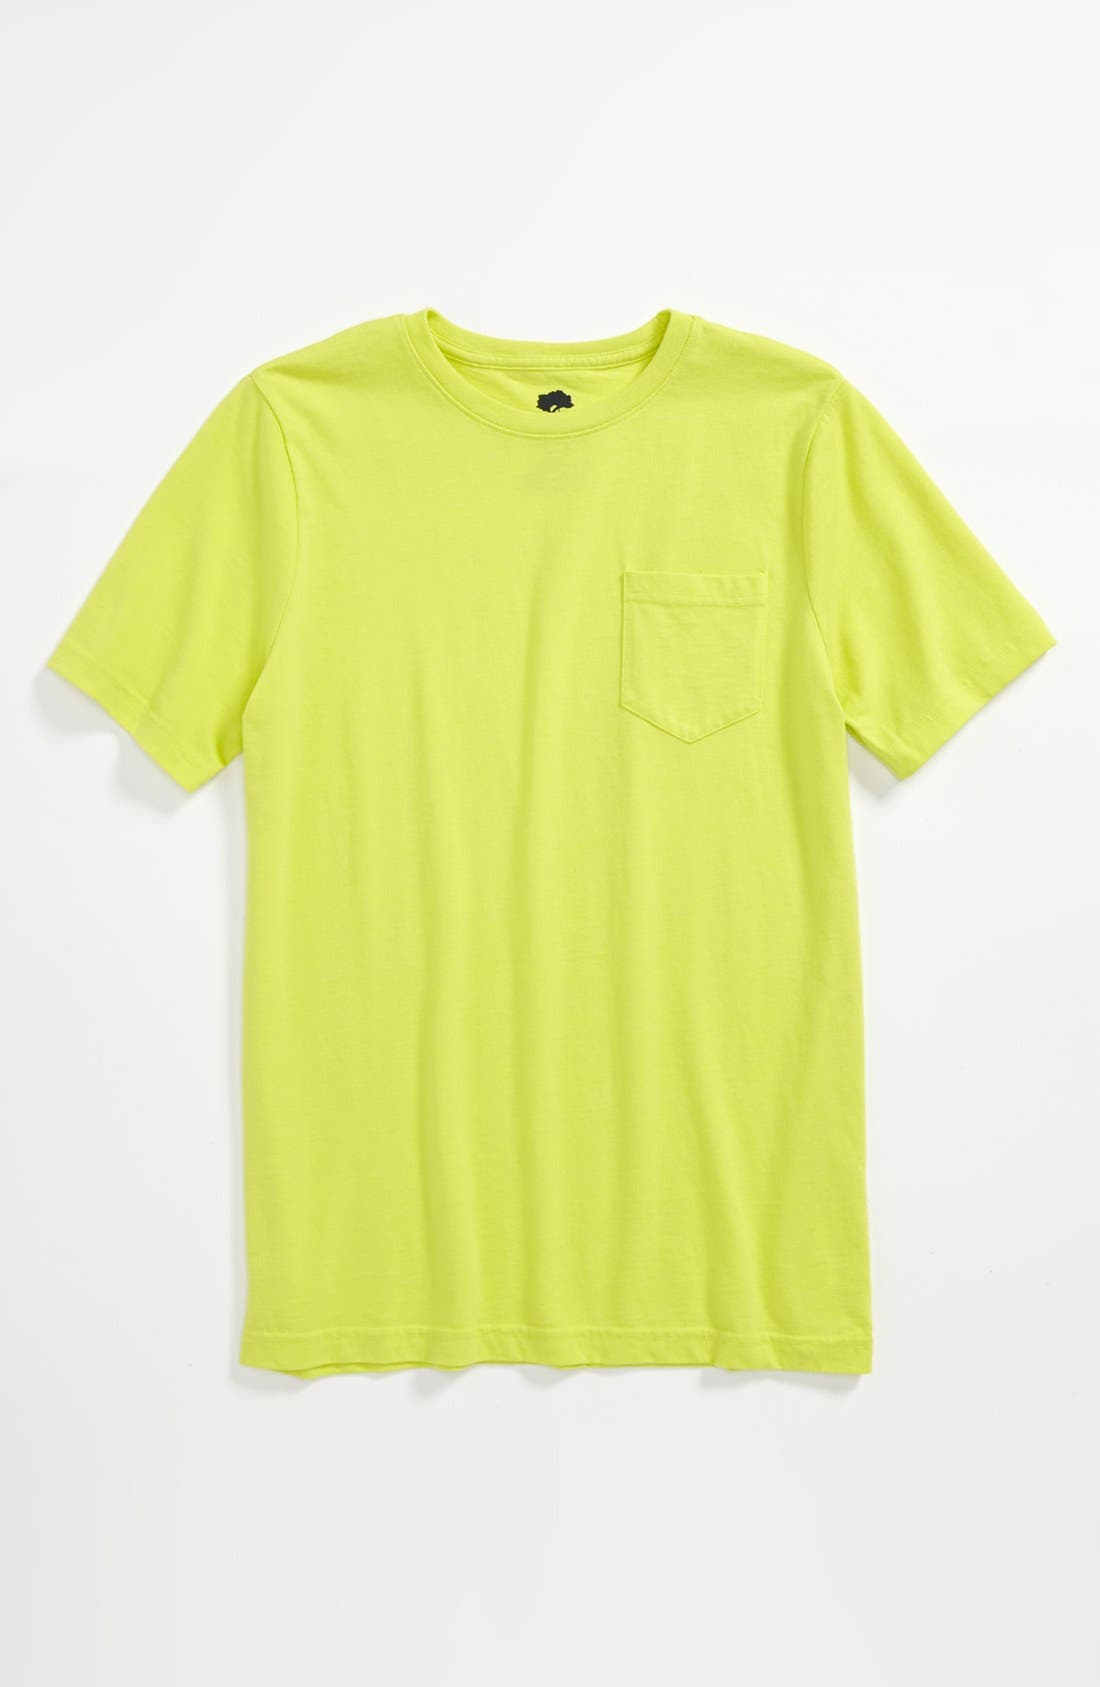 Alternate Image 1 Selected - Tucker + Tate 'Westlake' T-Shirt (Little Boys)